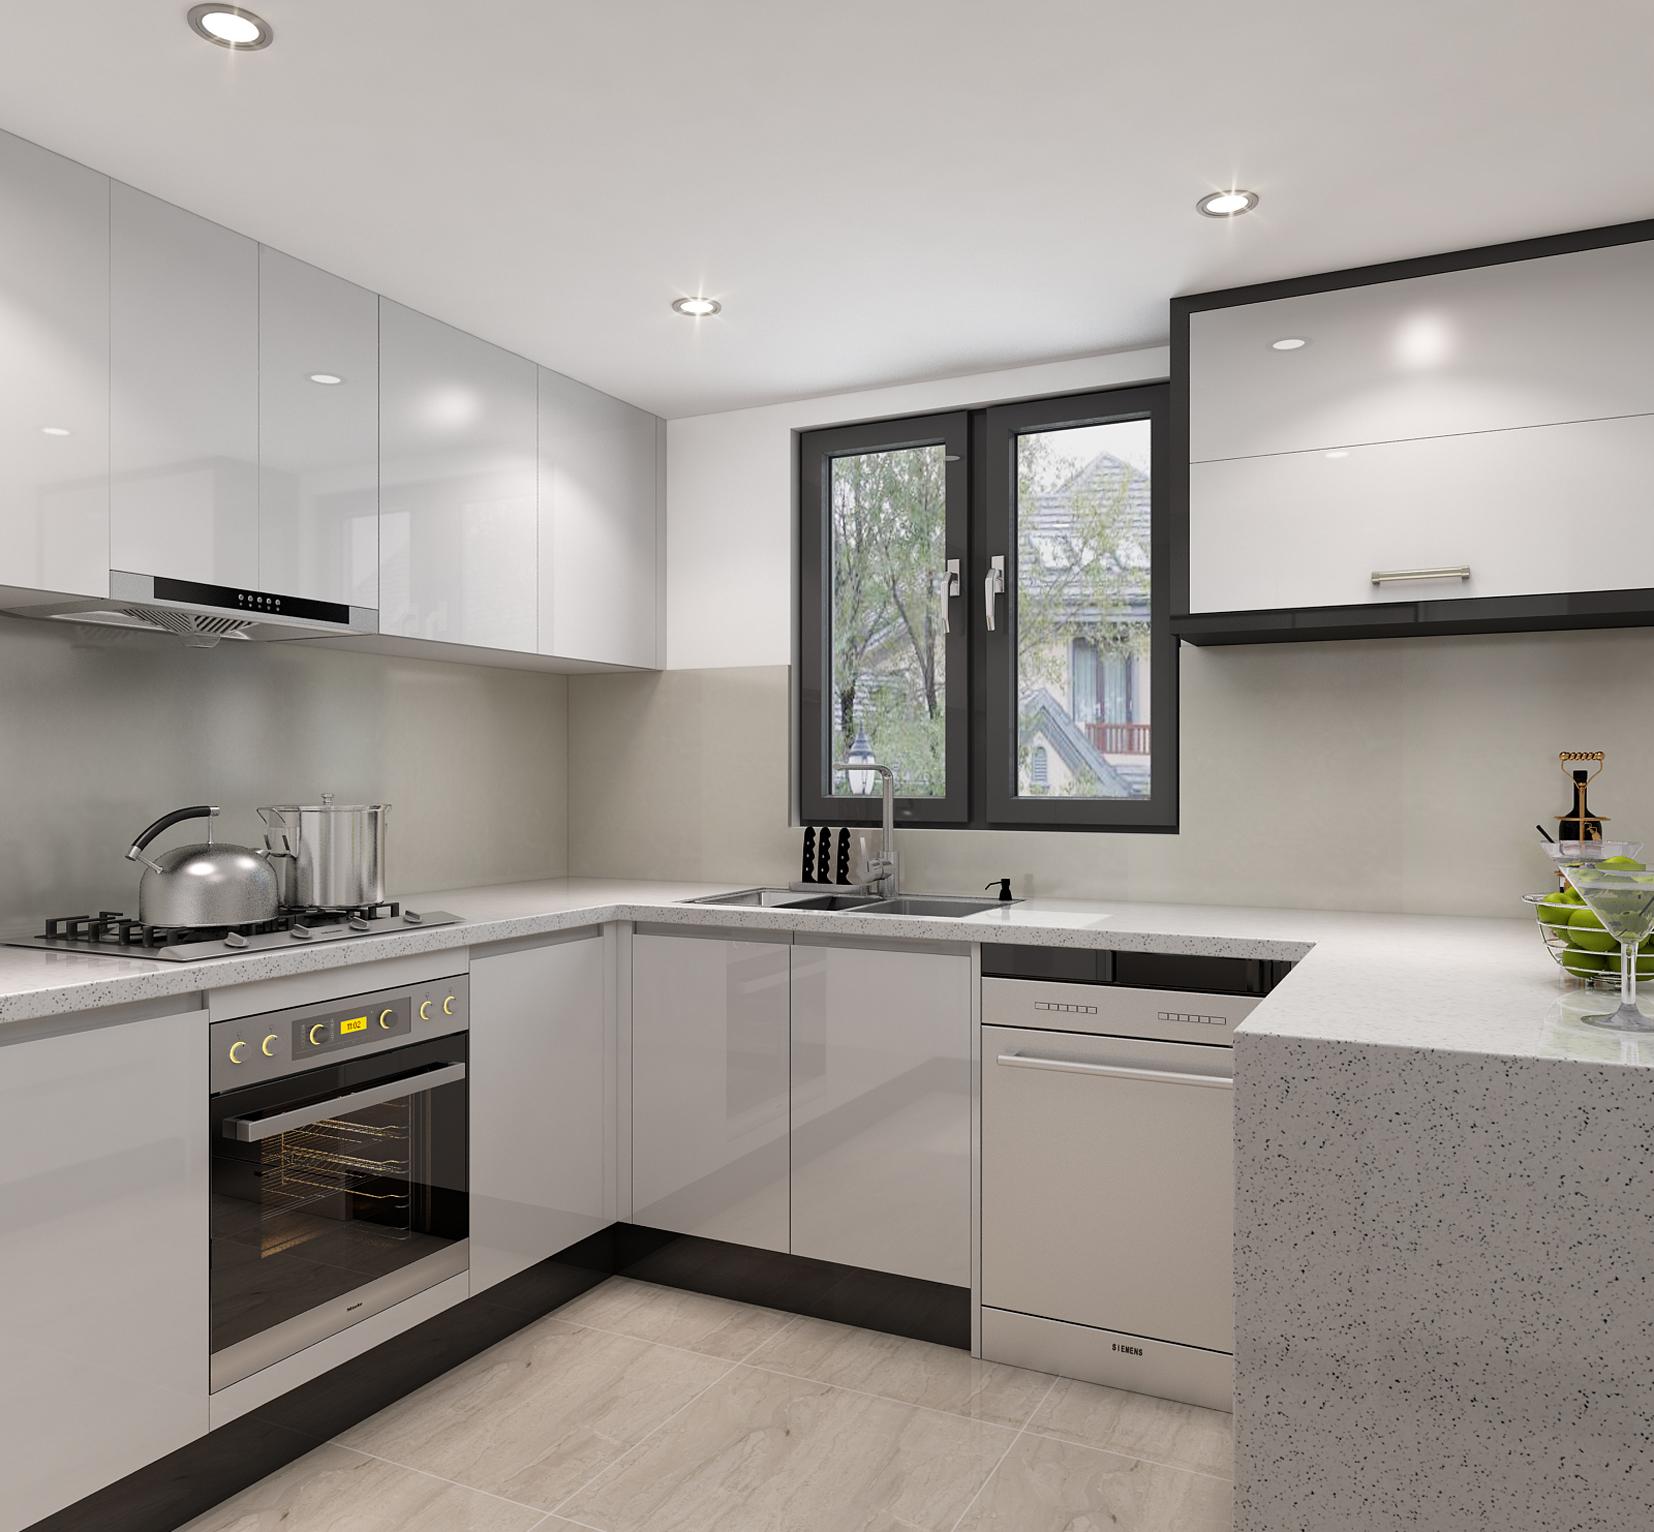 2018 Modern Kitchen Design With Fully Complete Kitchen Equipment Design Service Buy Kitchen Cabinet Classic Modern Kitchen Kitchen Disign Product On Alibaba Com